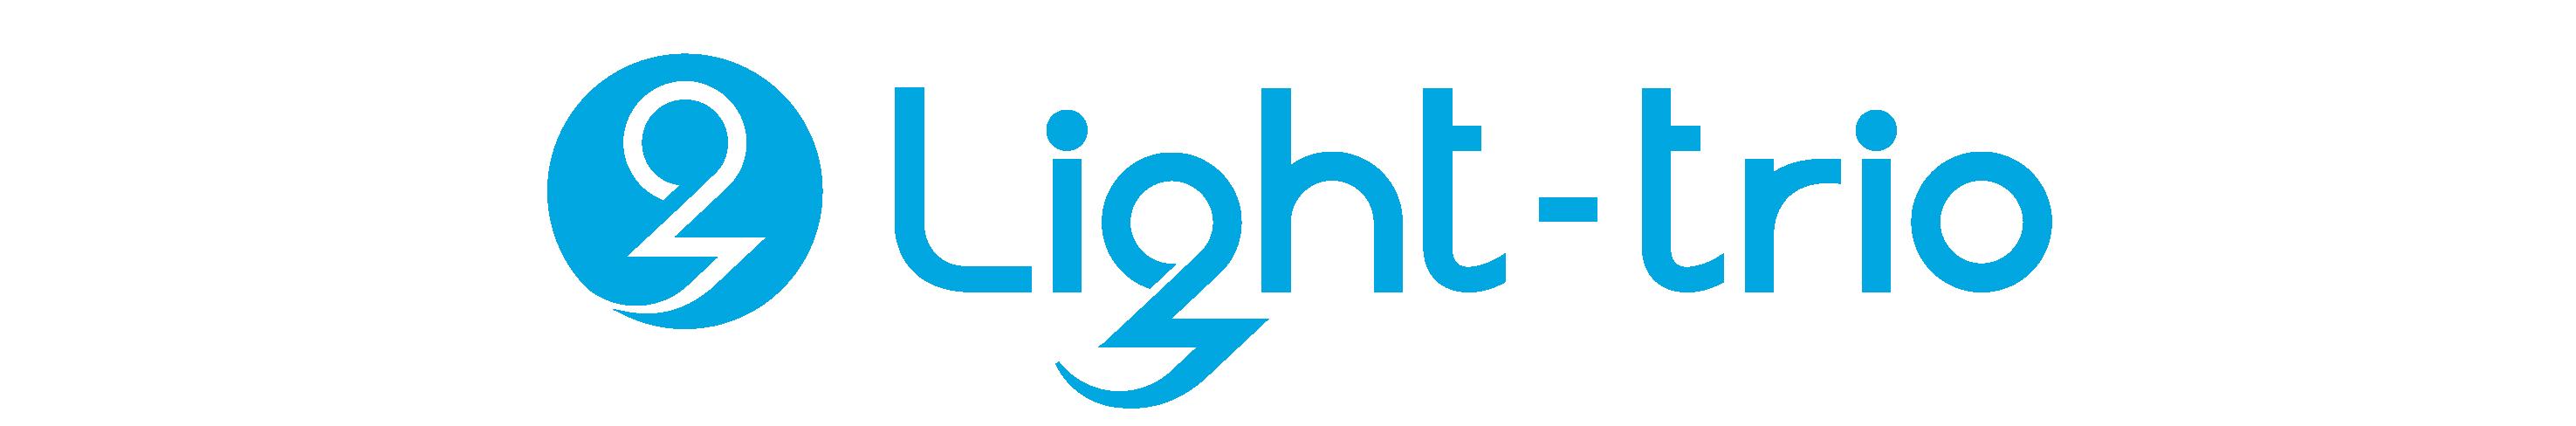 Lighttrio -